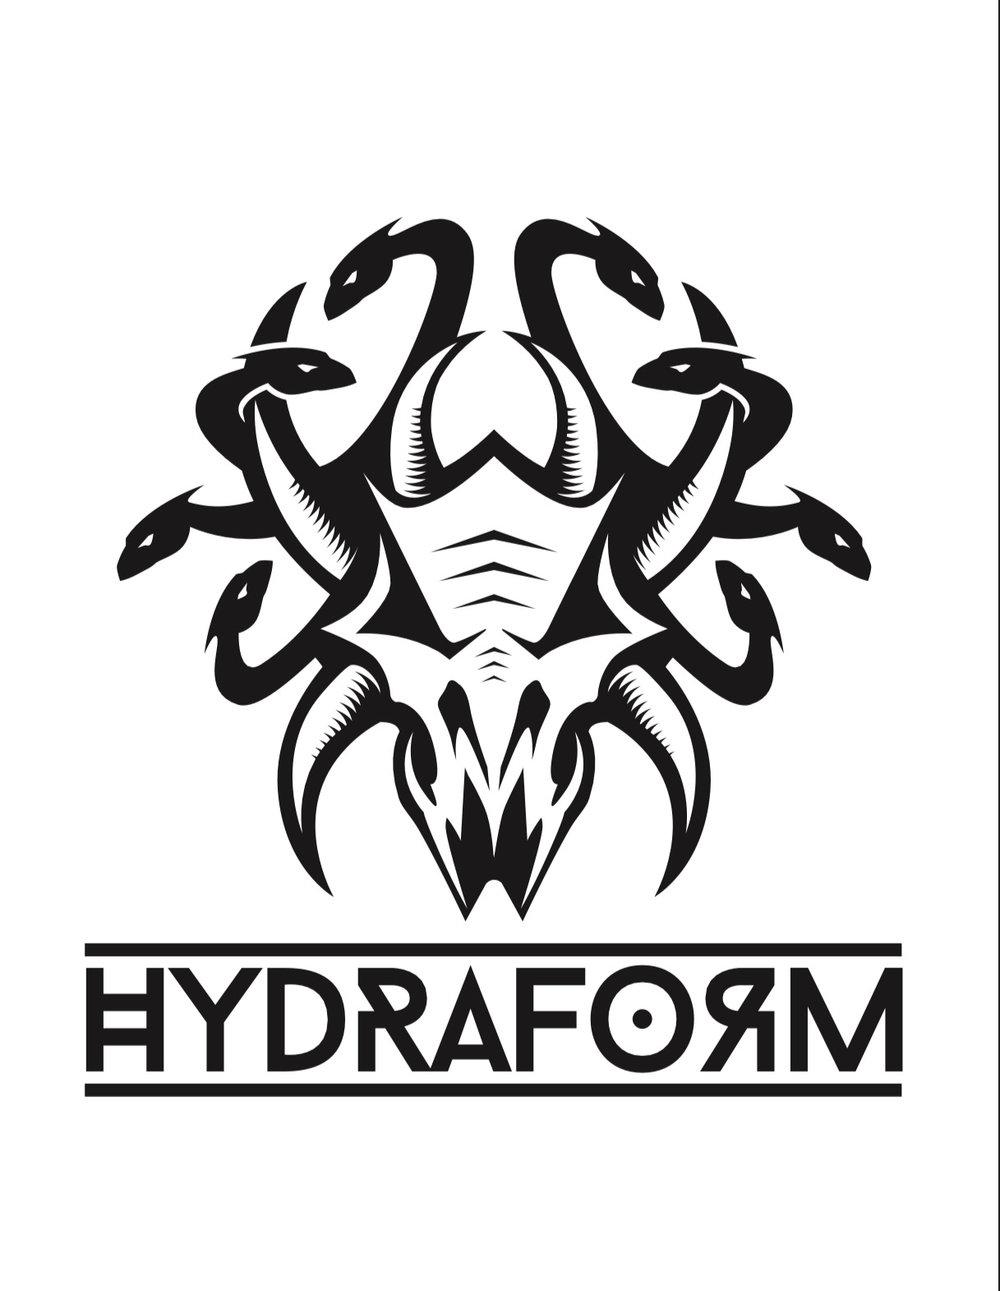 hydraform_Logos.JPG